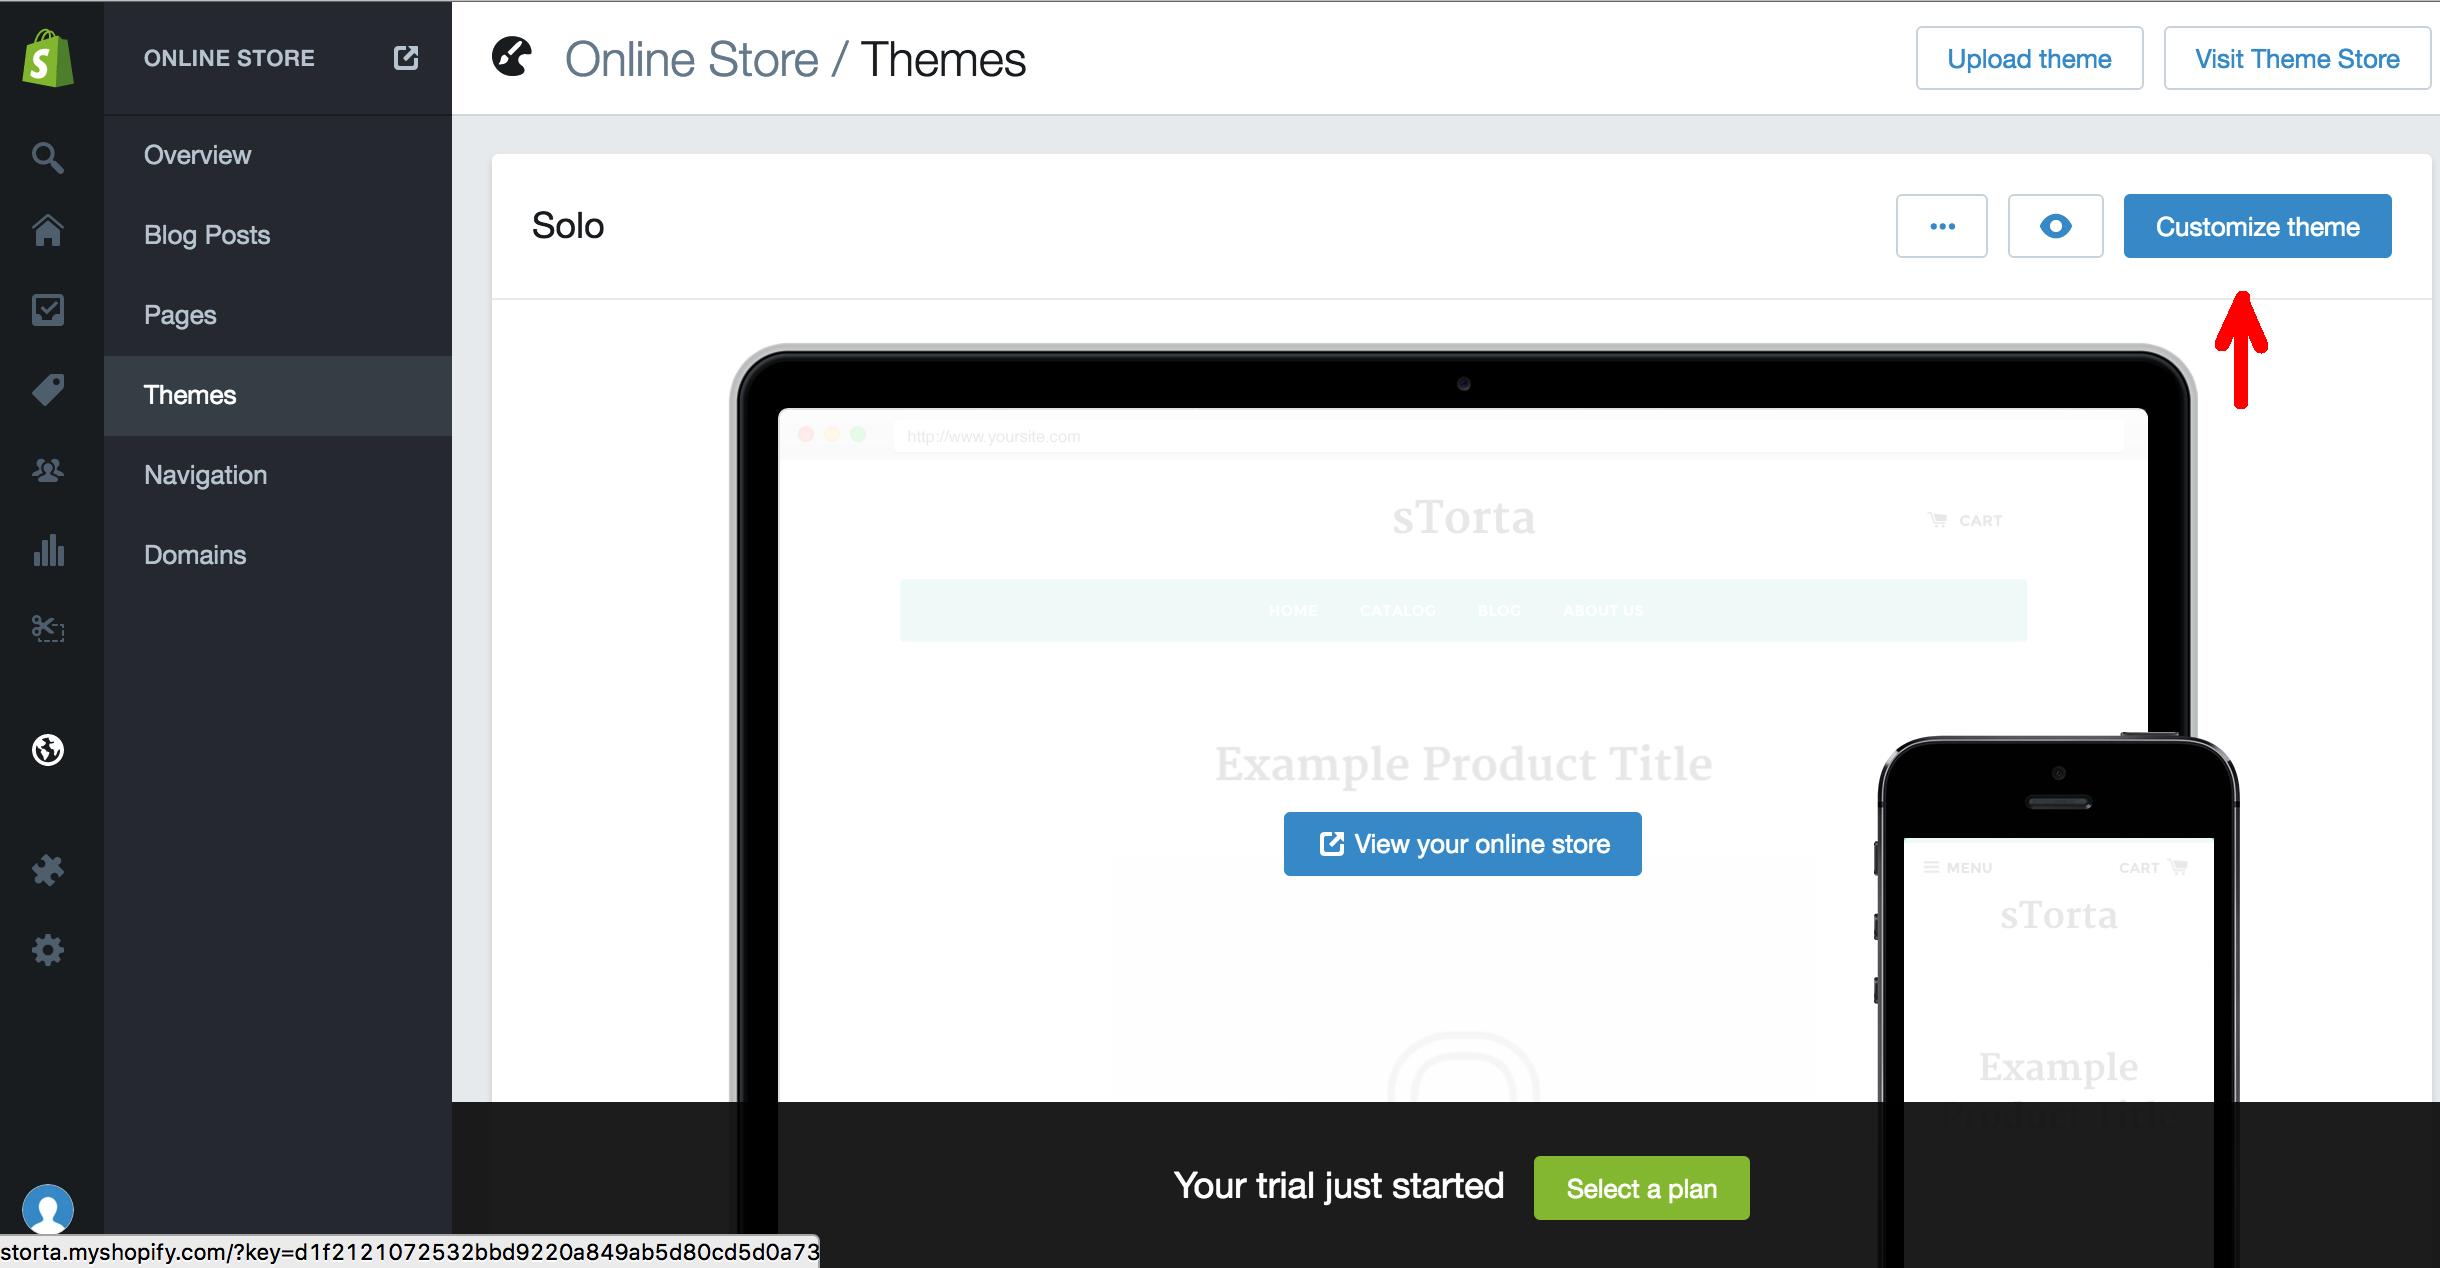 Shopify + iubenda : Customize Theme